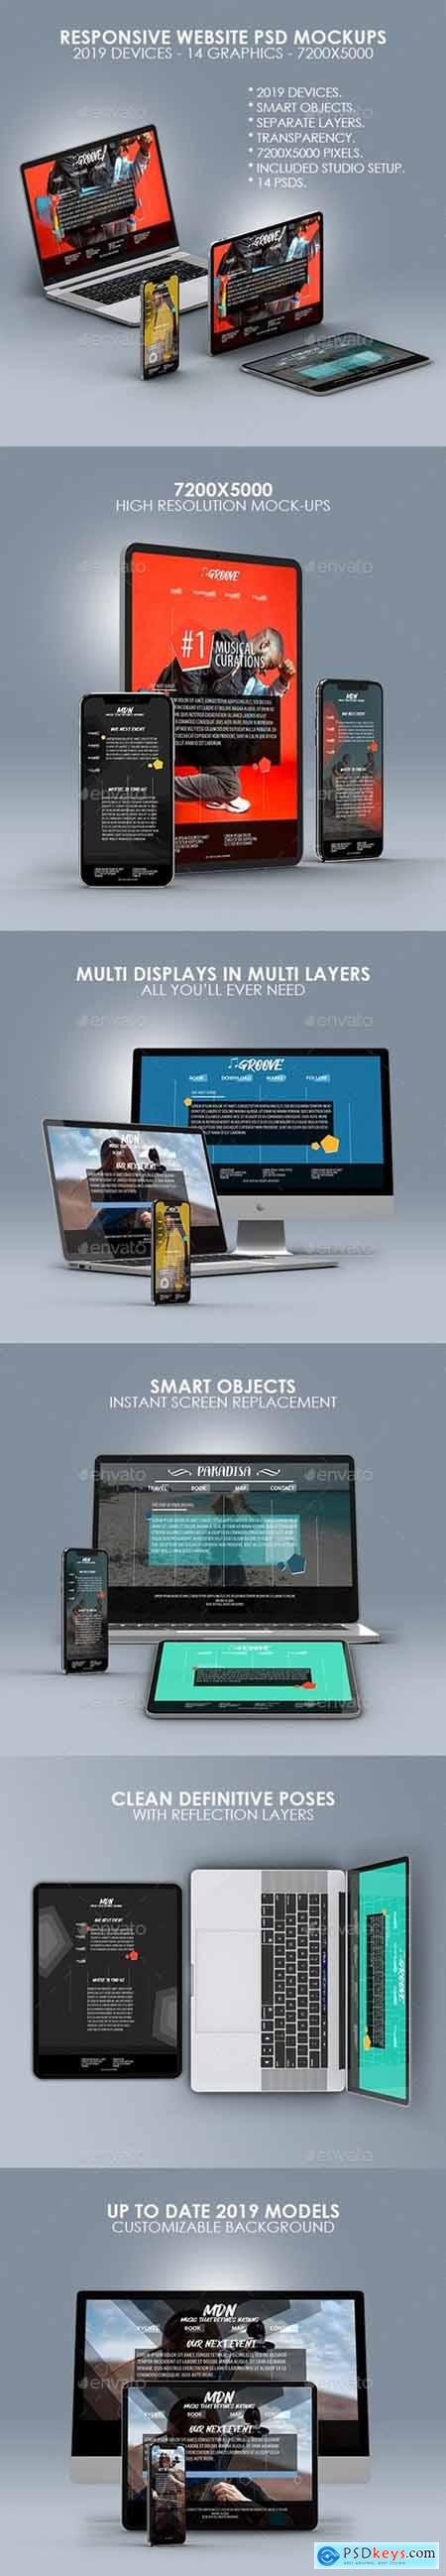 Responsive Website PSD Mock-ups 24723540